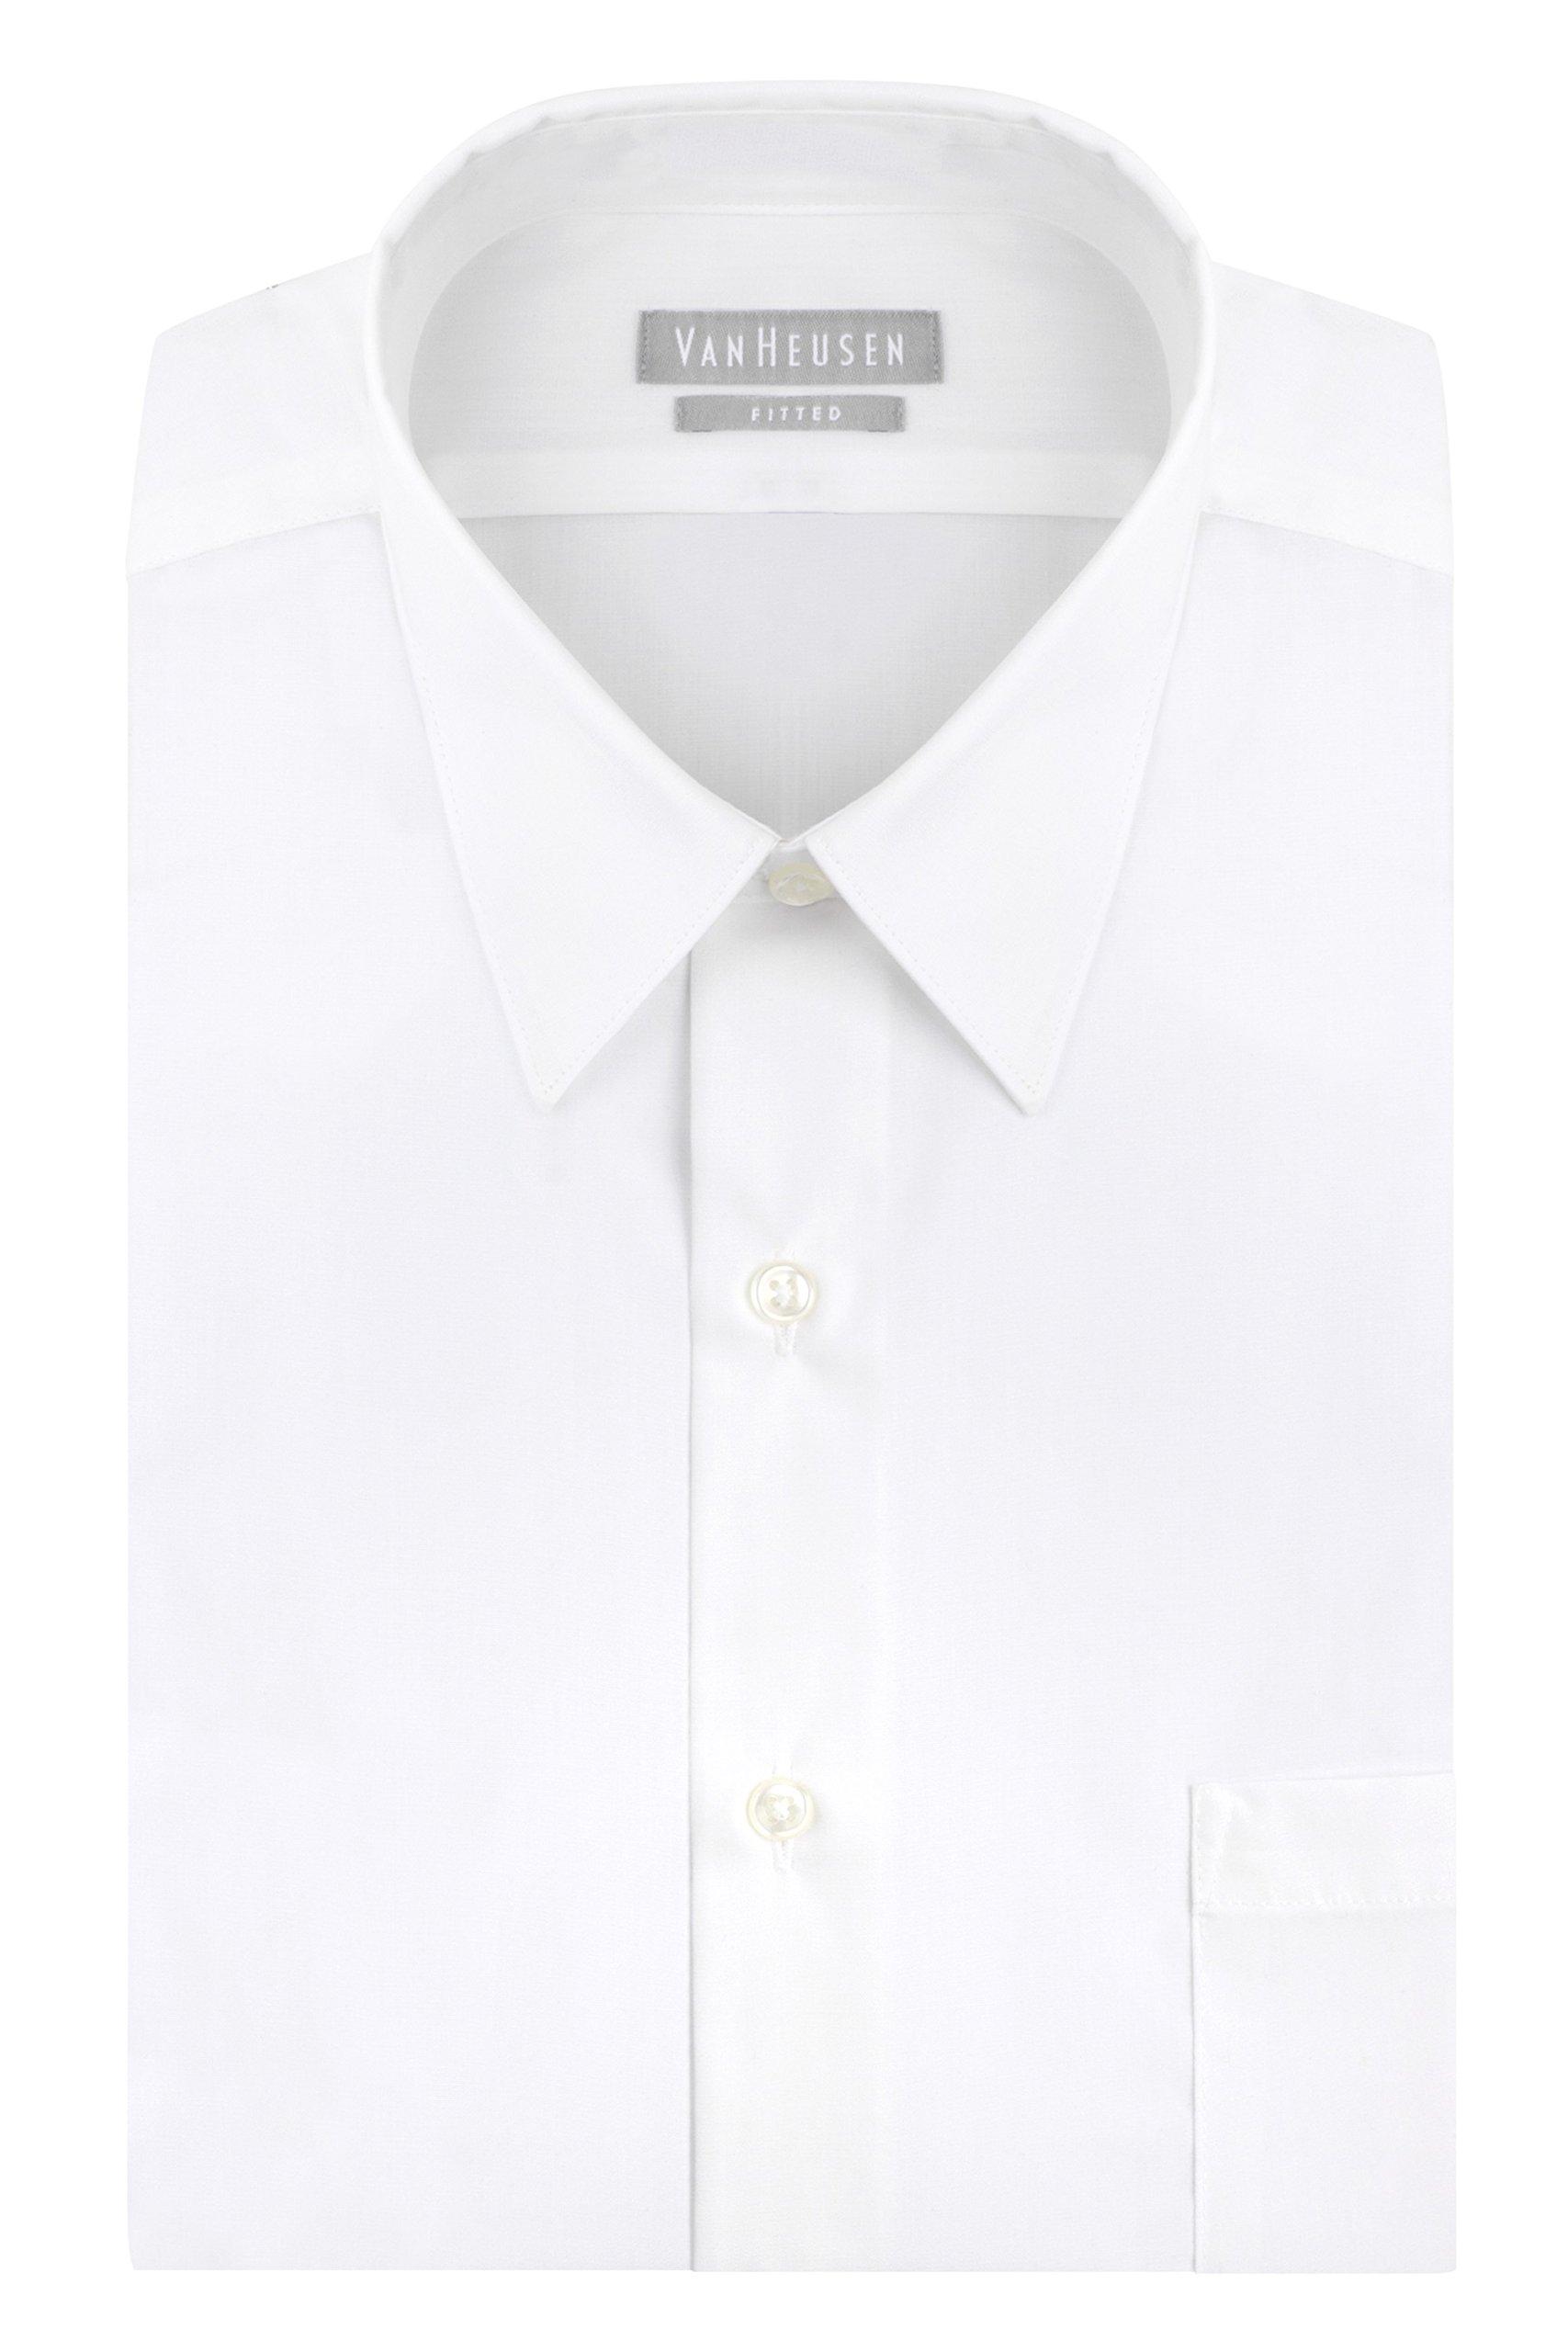 Van Heusen Men's Poplin Fitted Solid Point Collar Dress Shirt, White, 16.5'' Neck 34''-35'' Sleeve